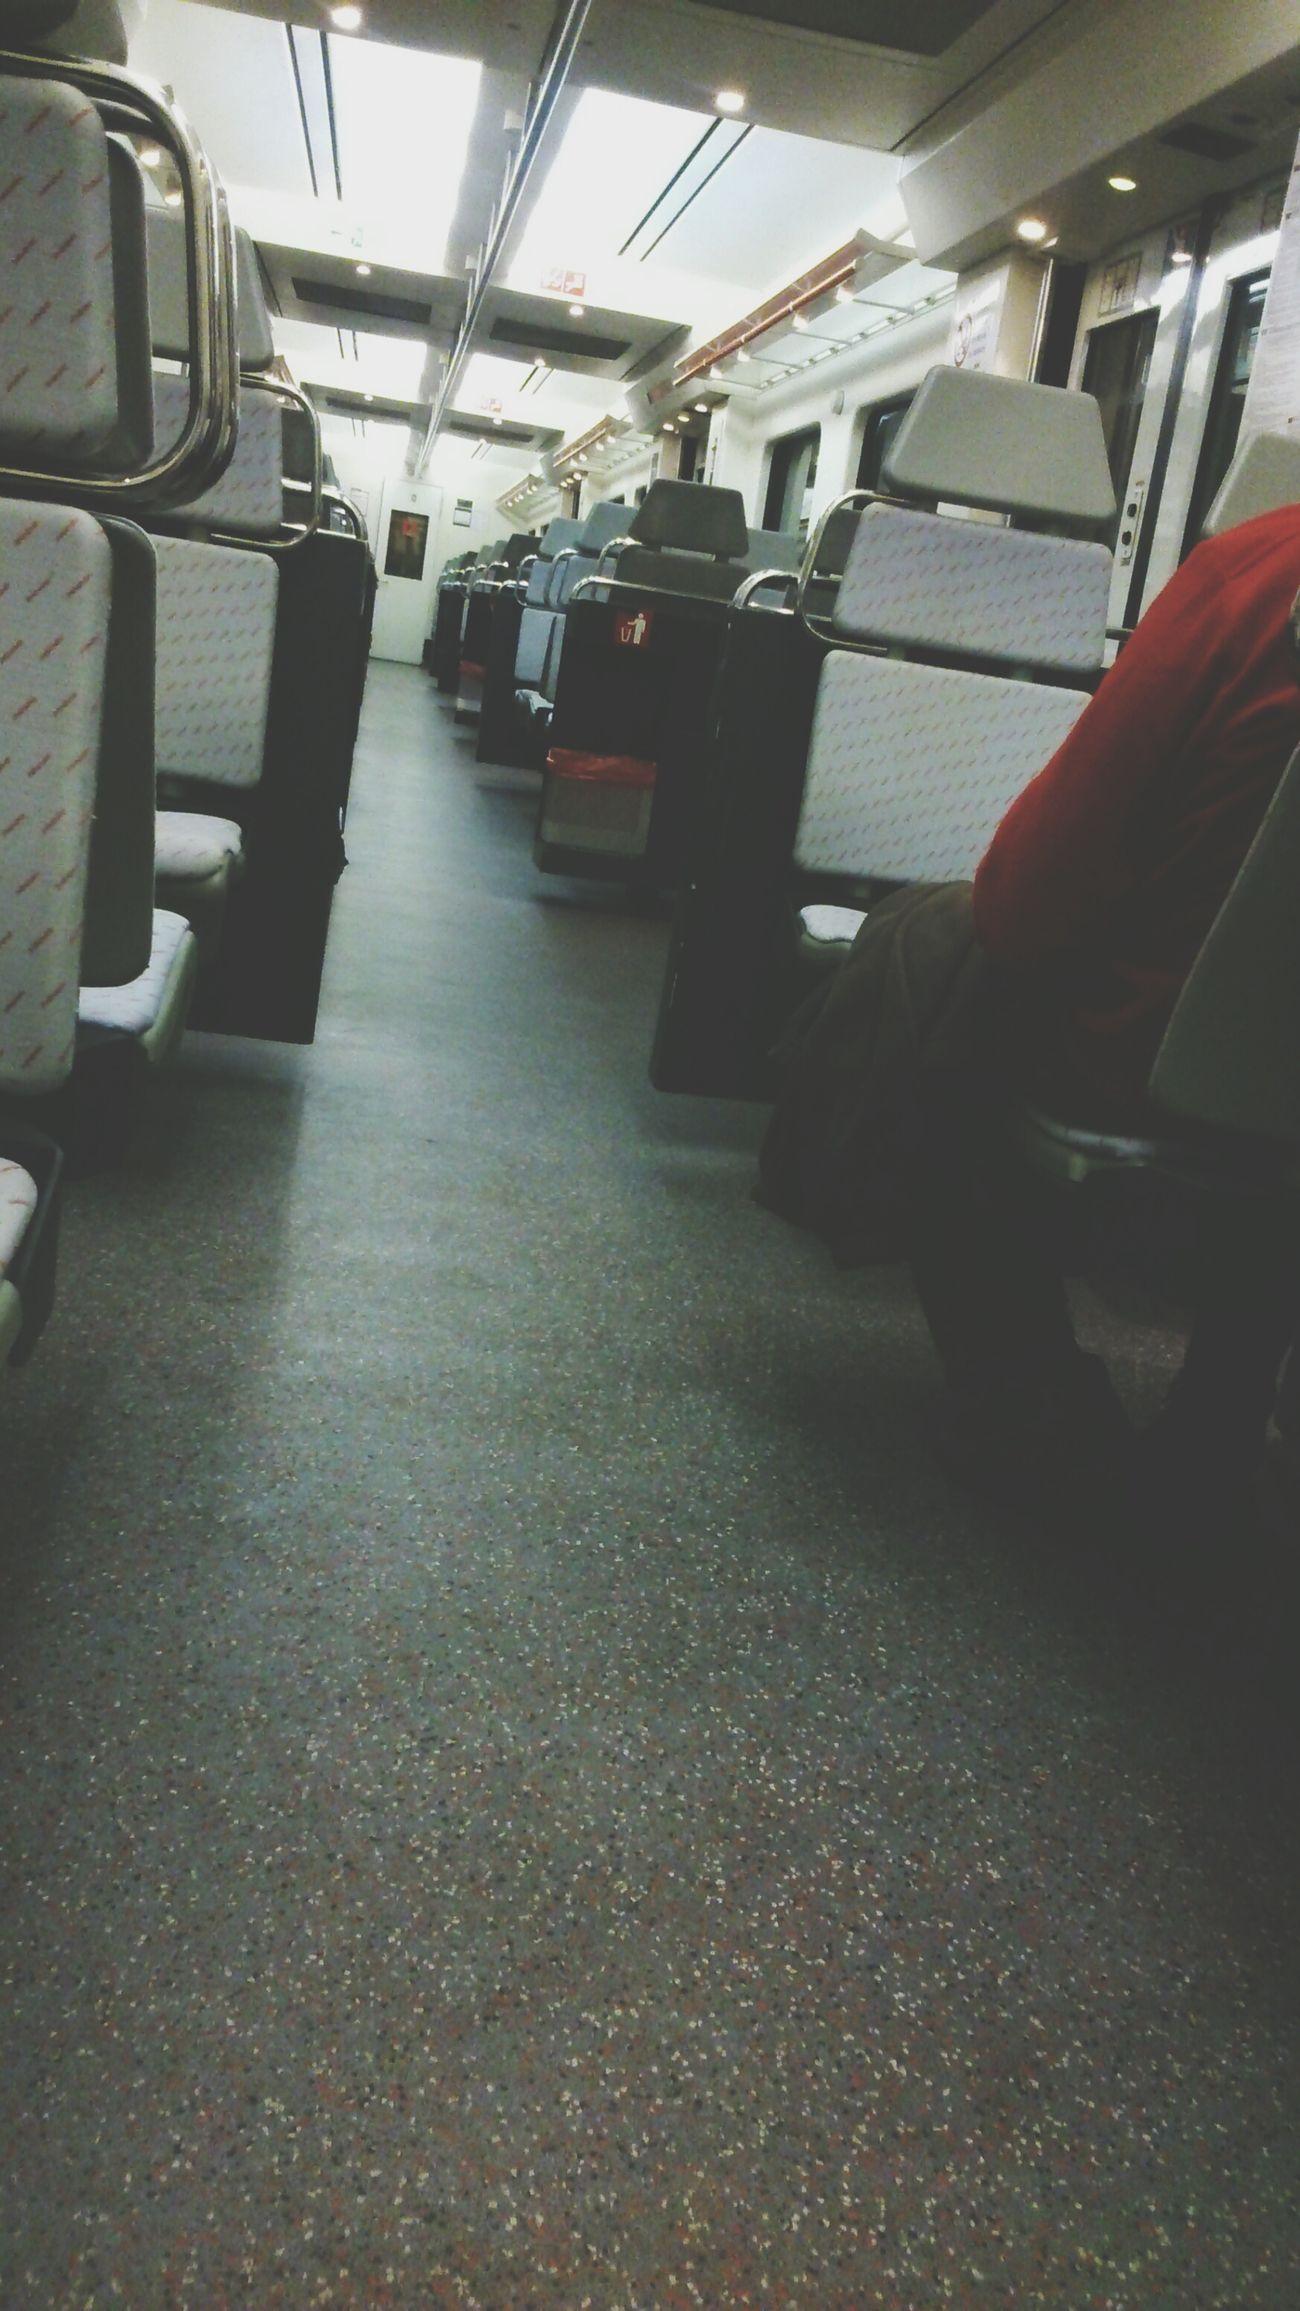 Train Morning por la mañana tempranito pillamos el trenecito Sleeping